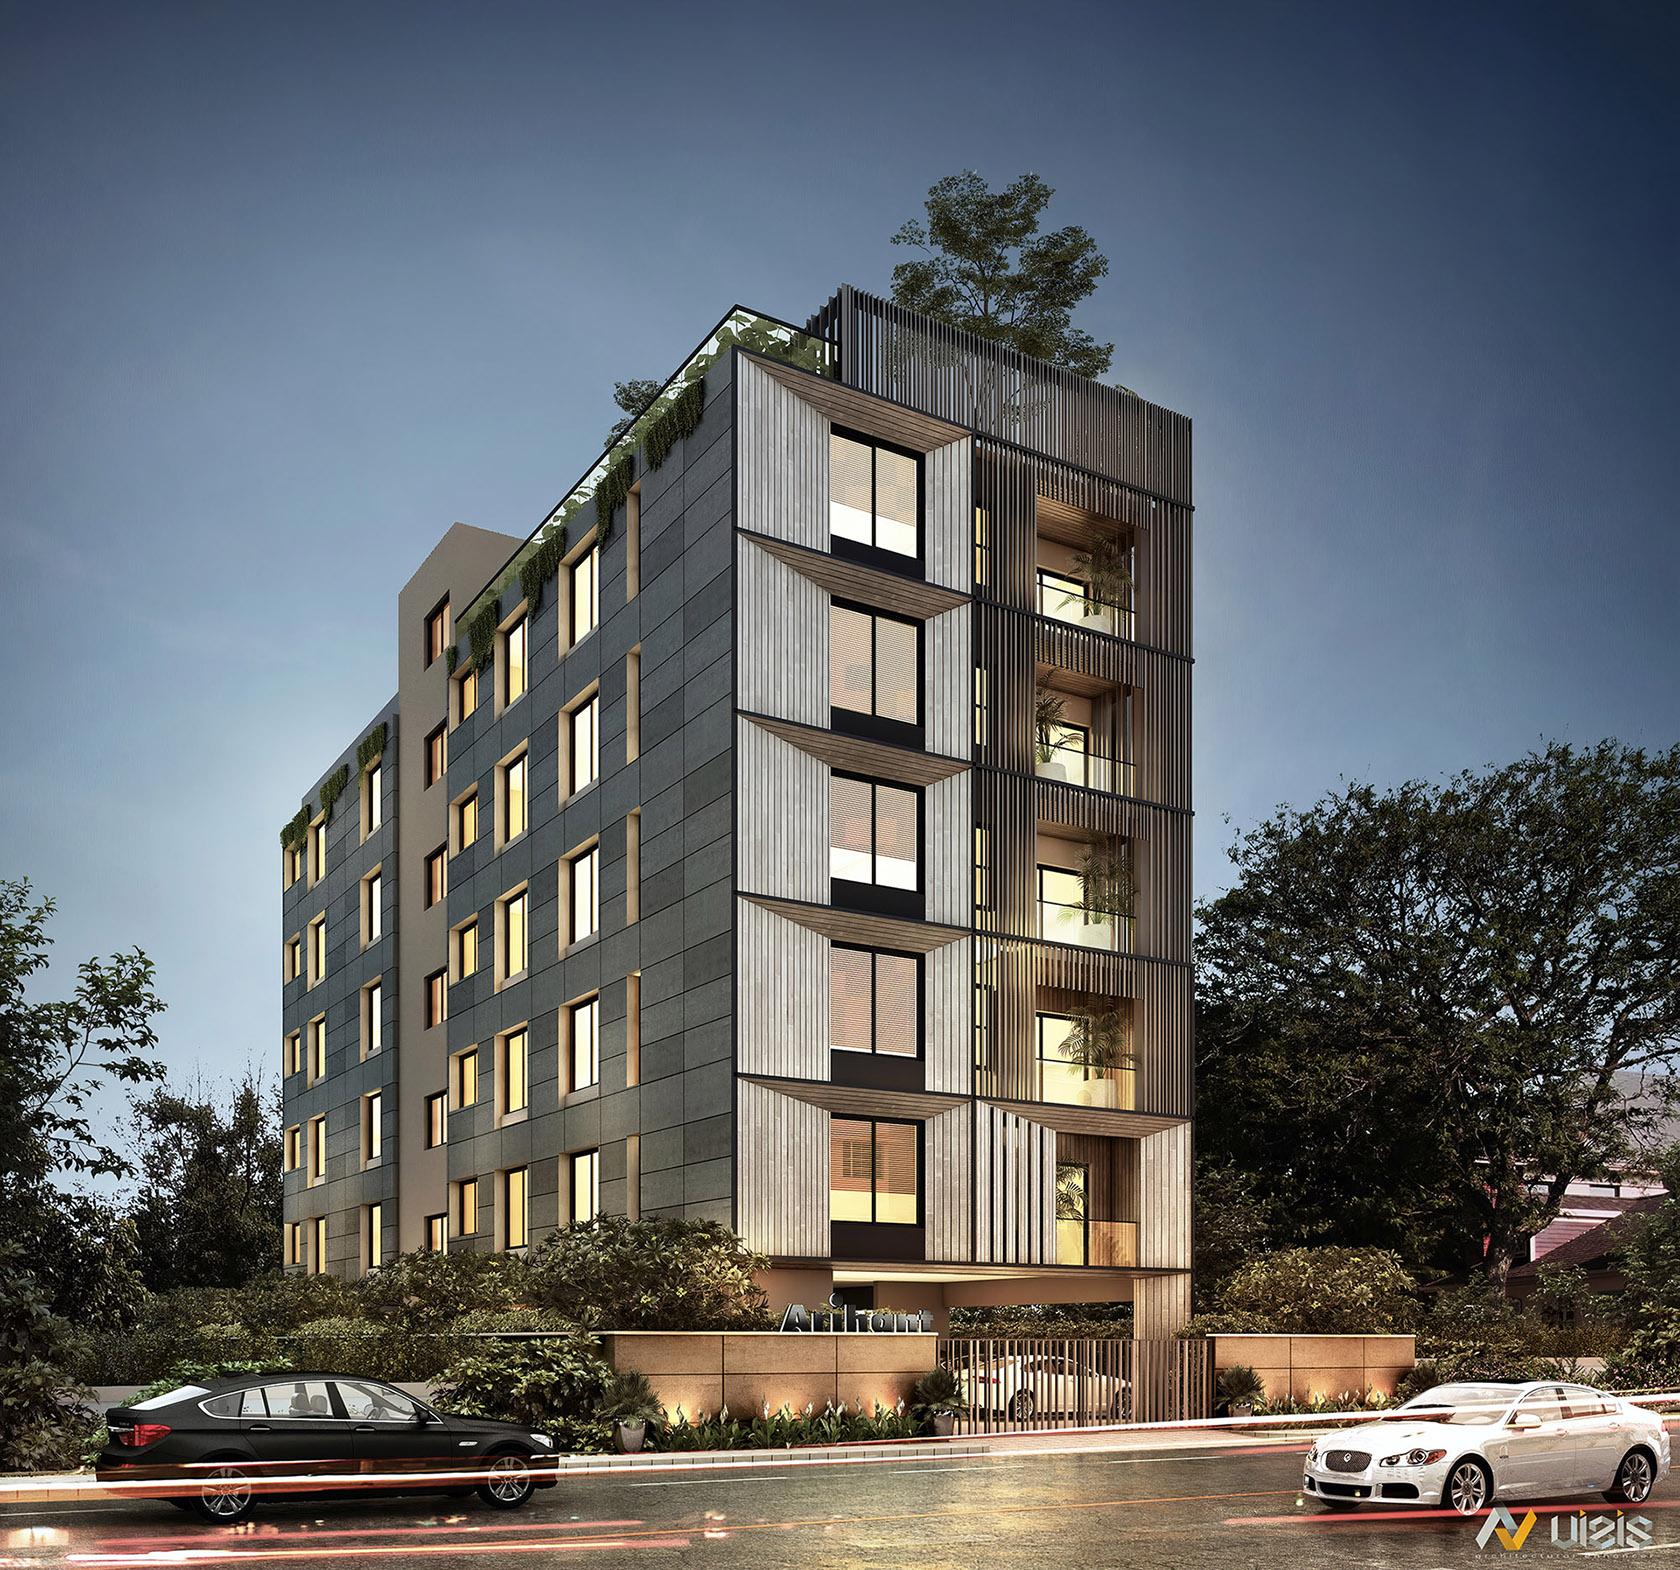 Arihant Vinyasa - Chennai Luxury Apartments